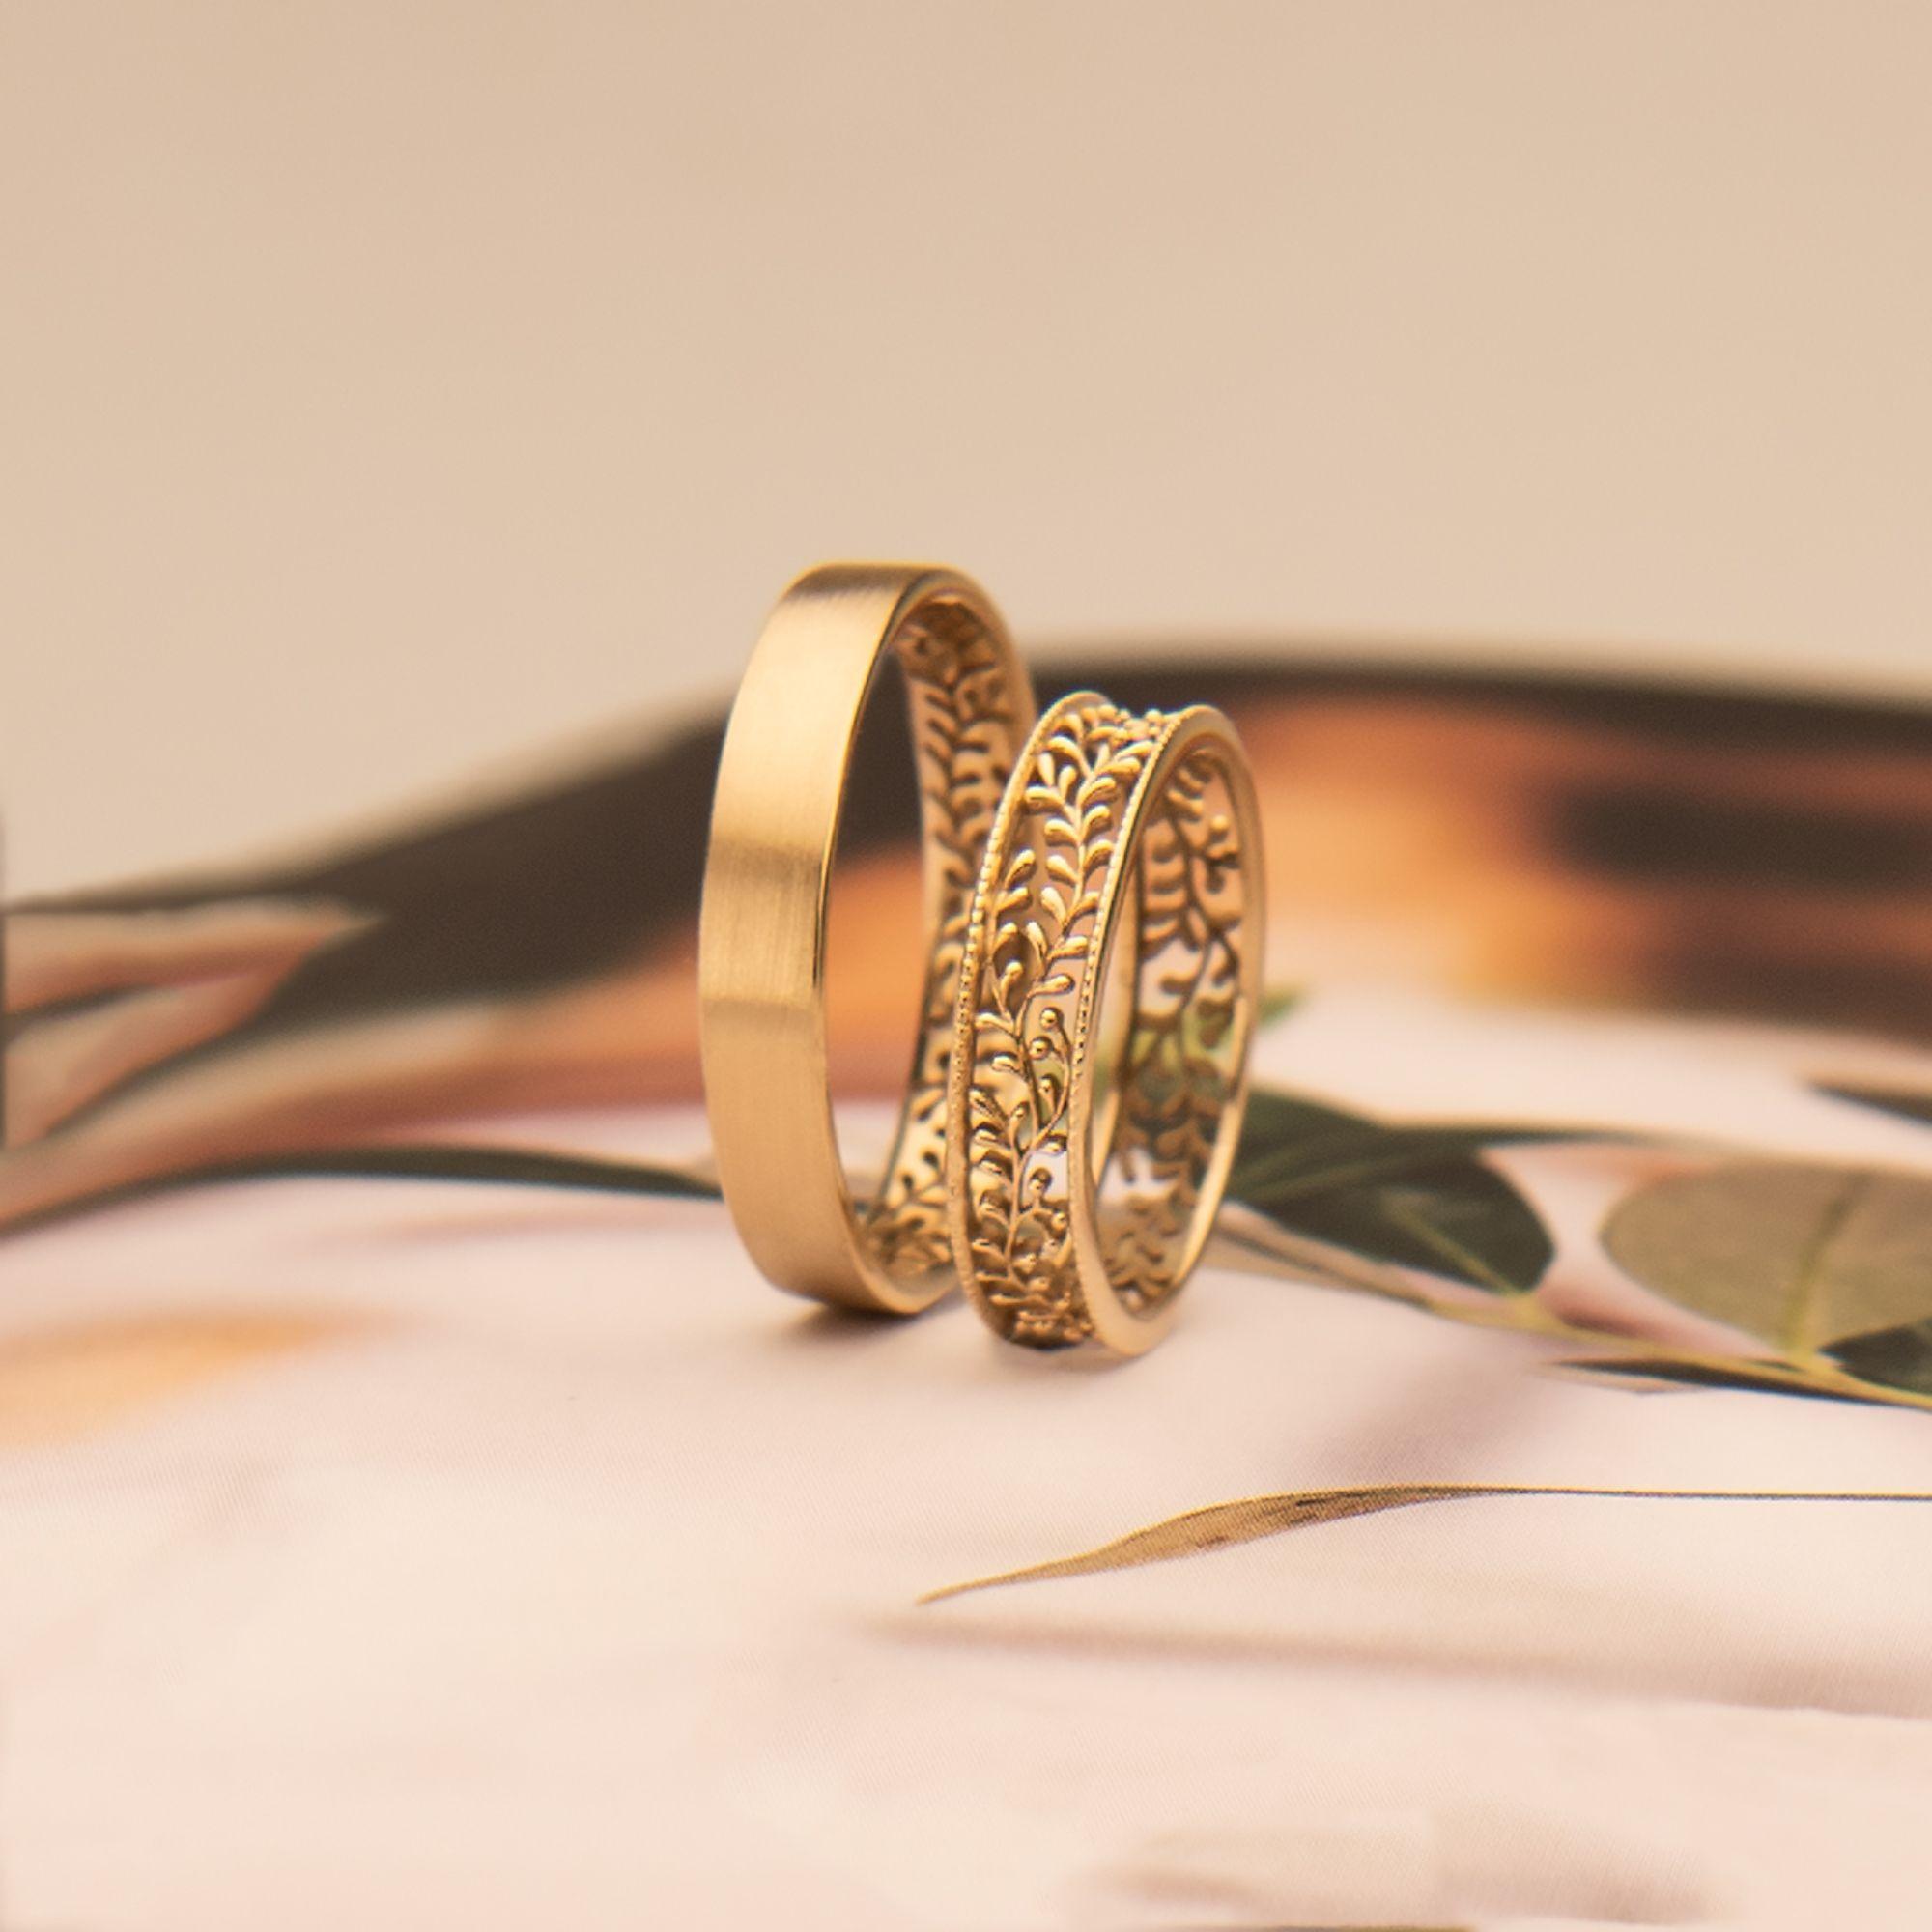 Boho Queen I Woodstock Obraczki Boho Wedding Boho Rings Rings Mens Wedding Bands Boho Wedding Ring Wedding Rings Unique